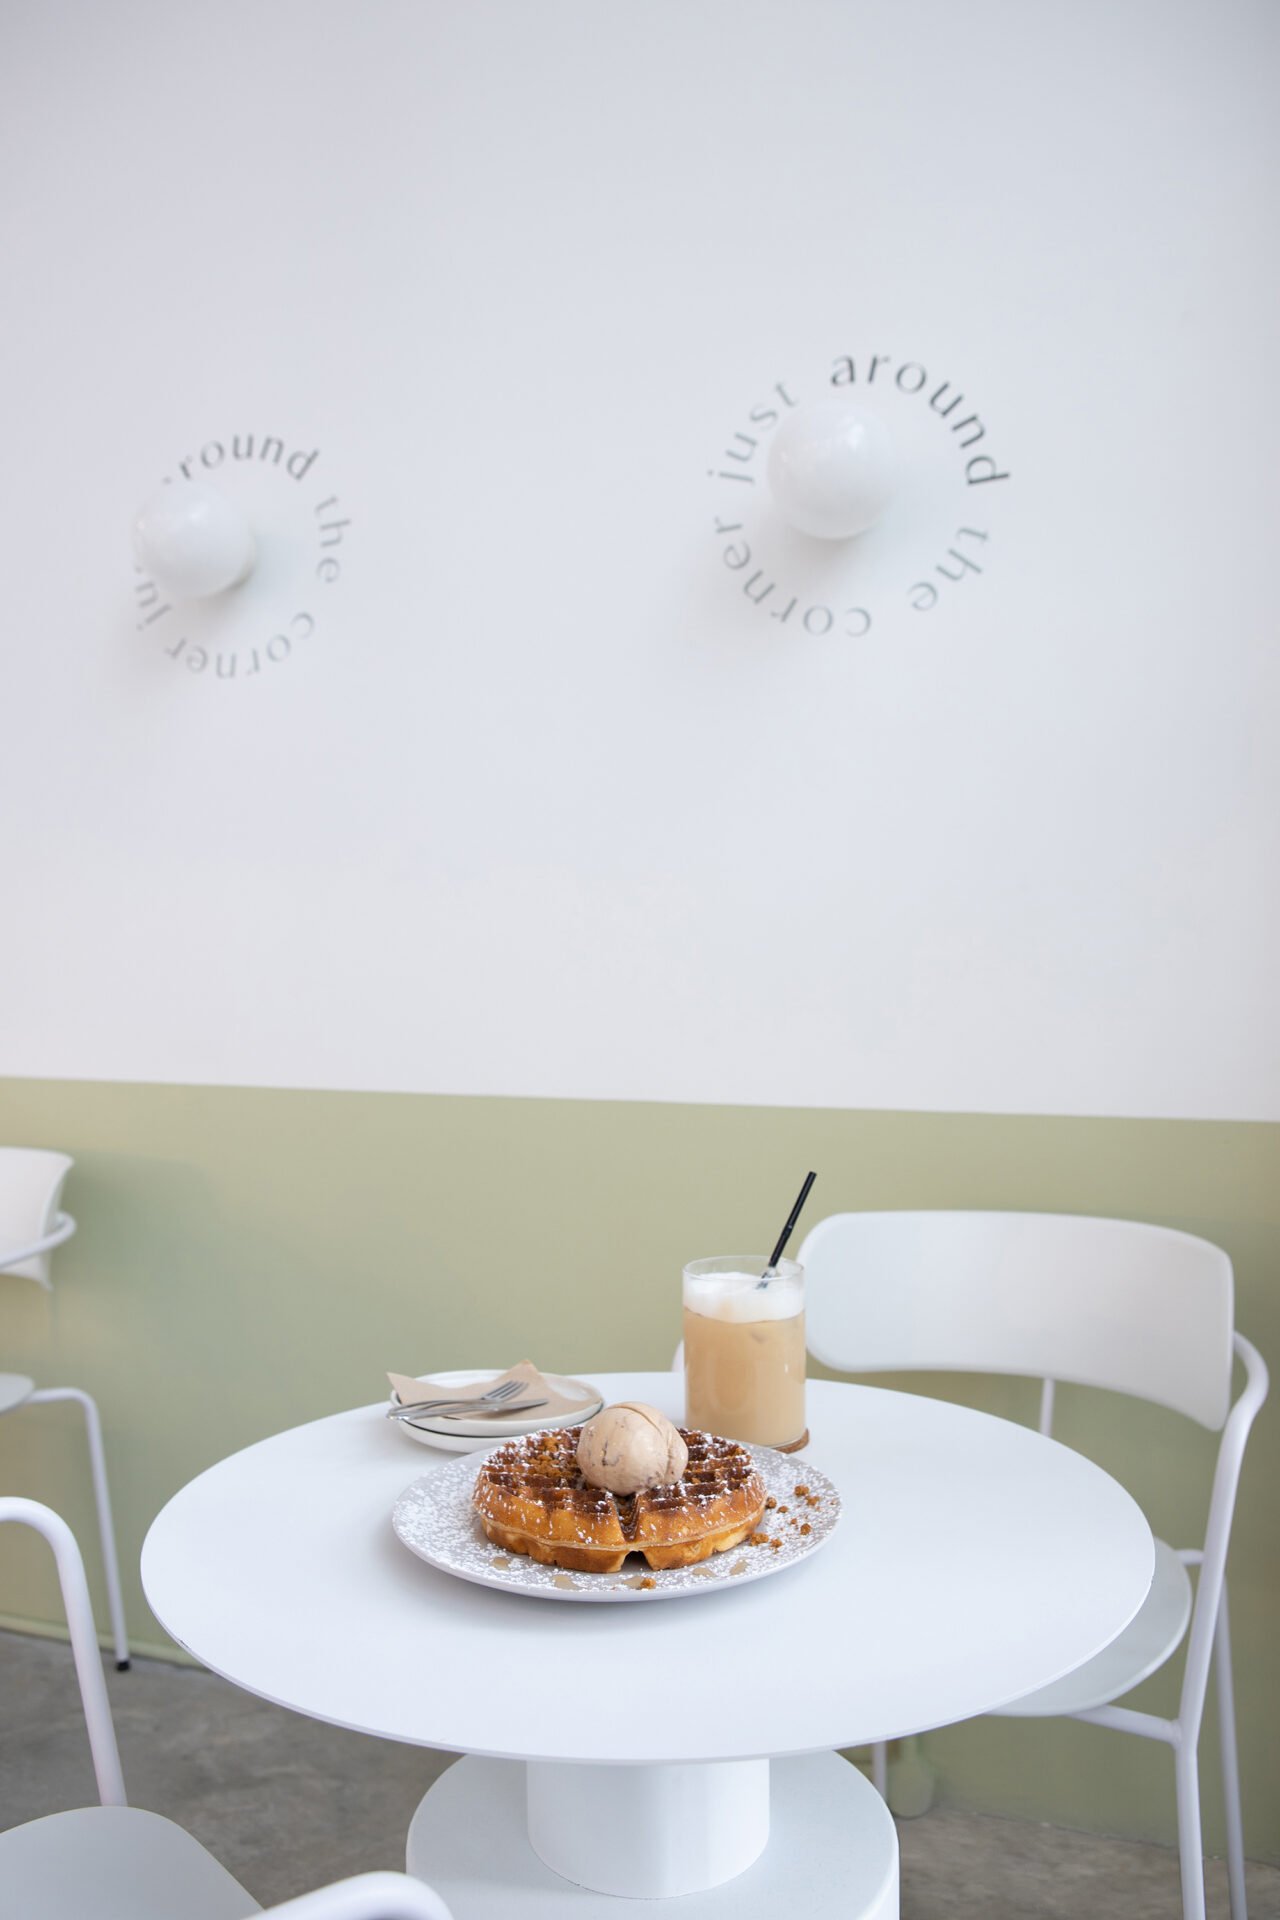 ascend design ice cream waffles cafe interior food 2